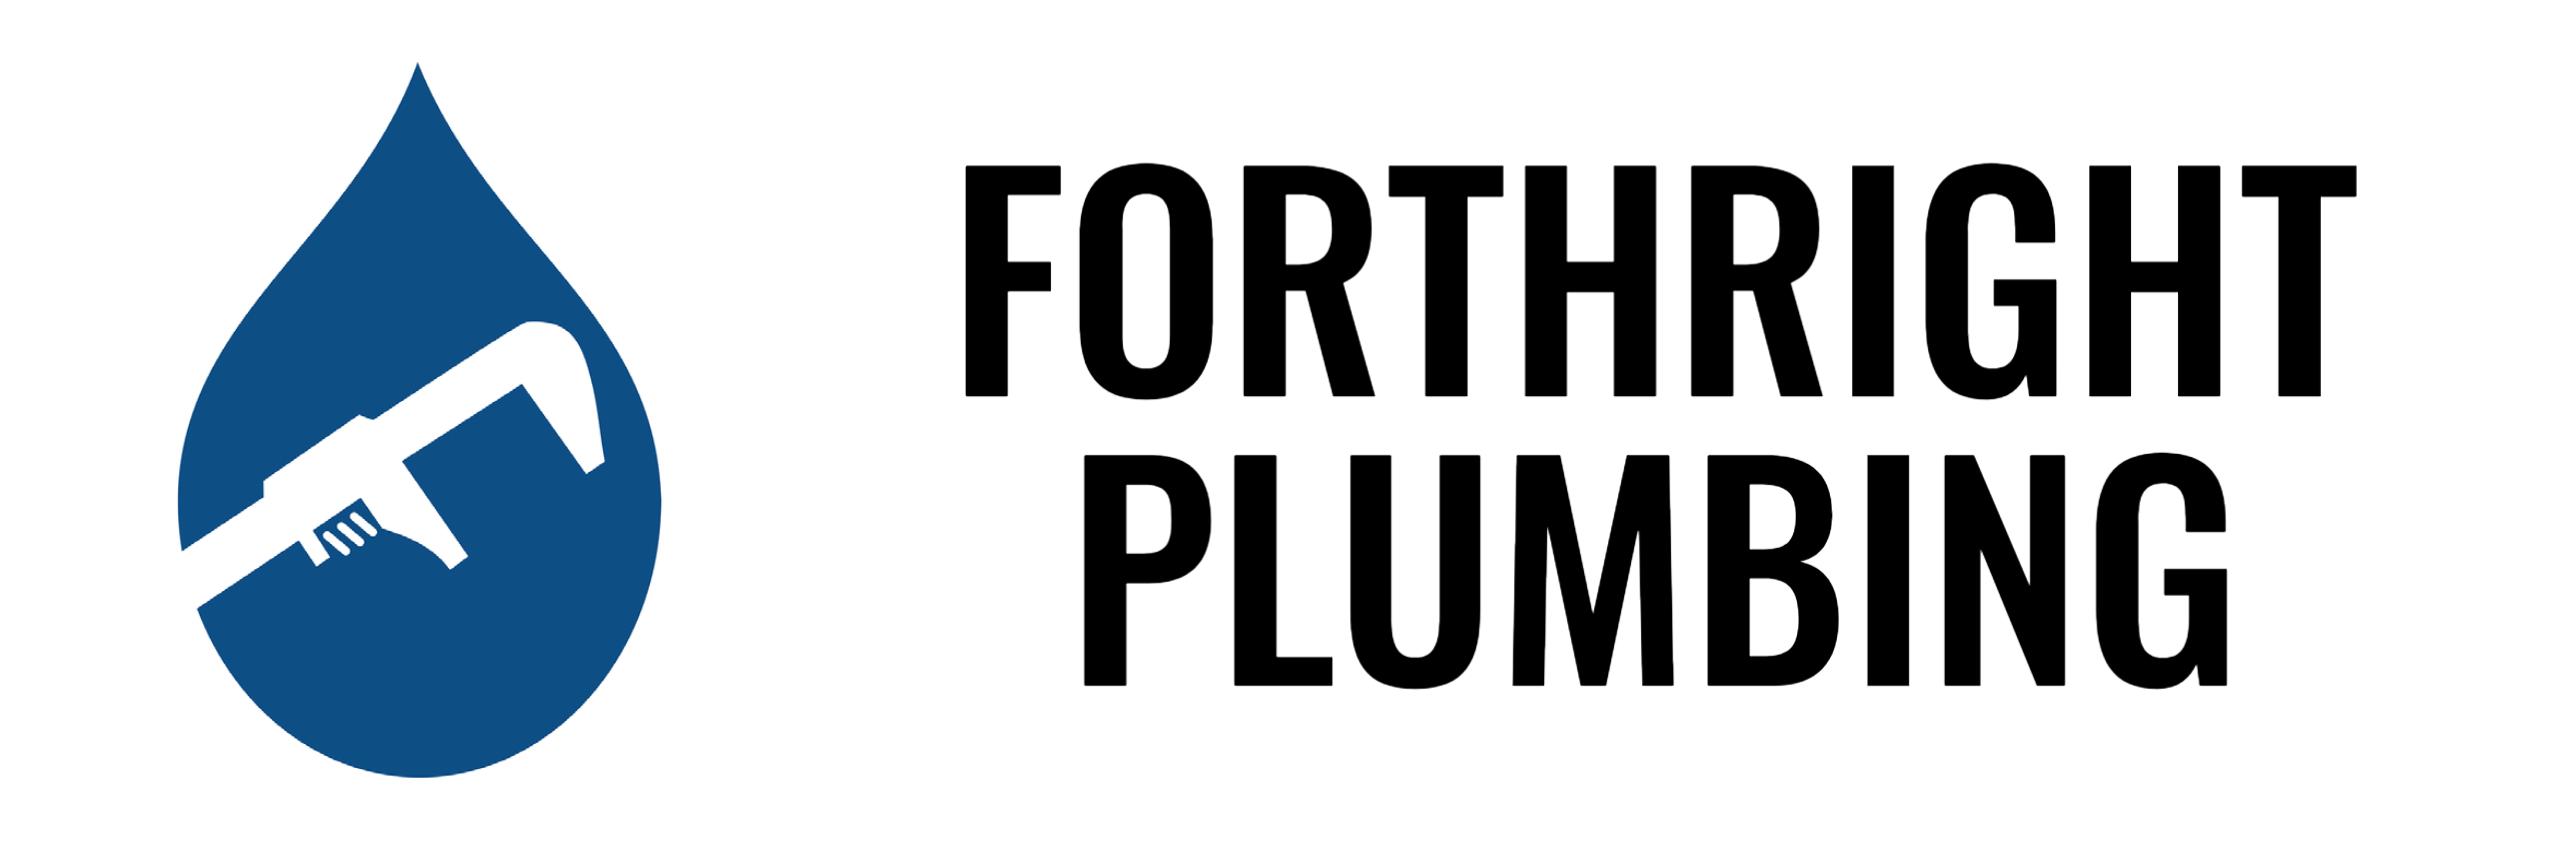 Forthright Plumbing Logo